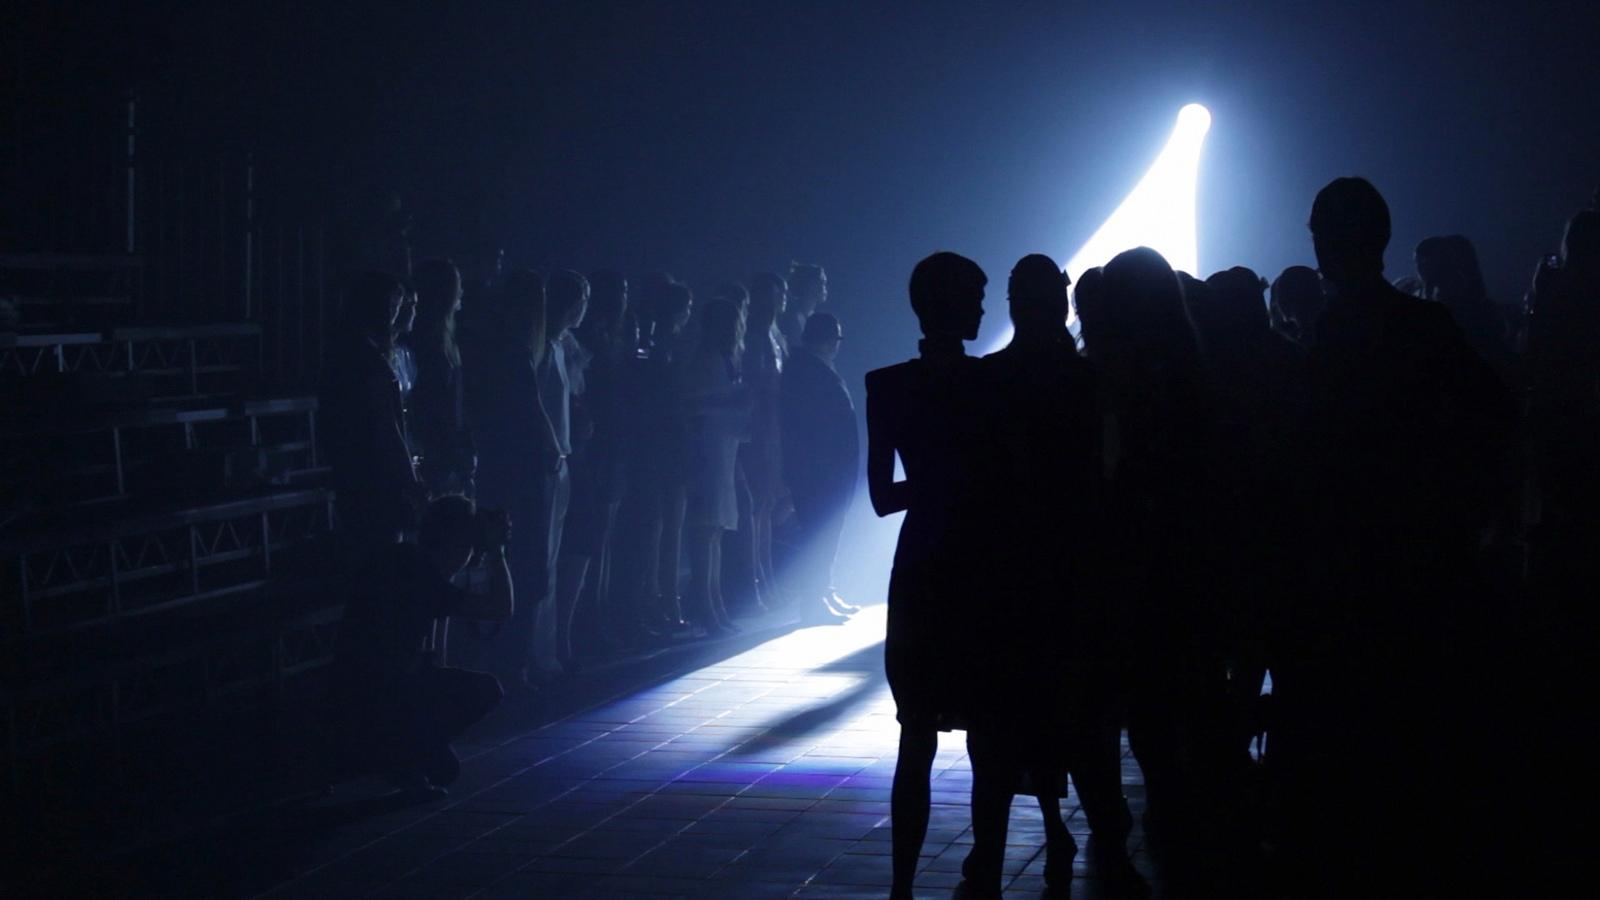 Isabel Marant & Lanvin 2 image